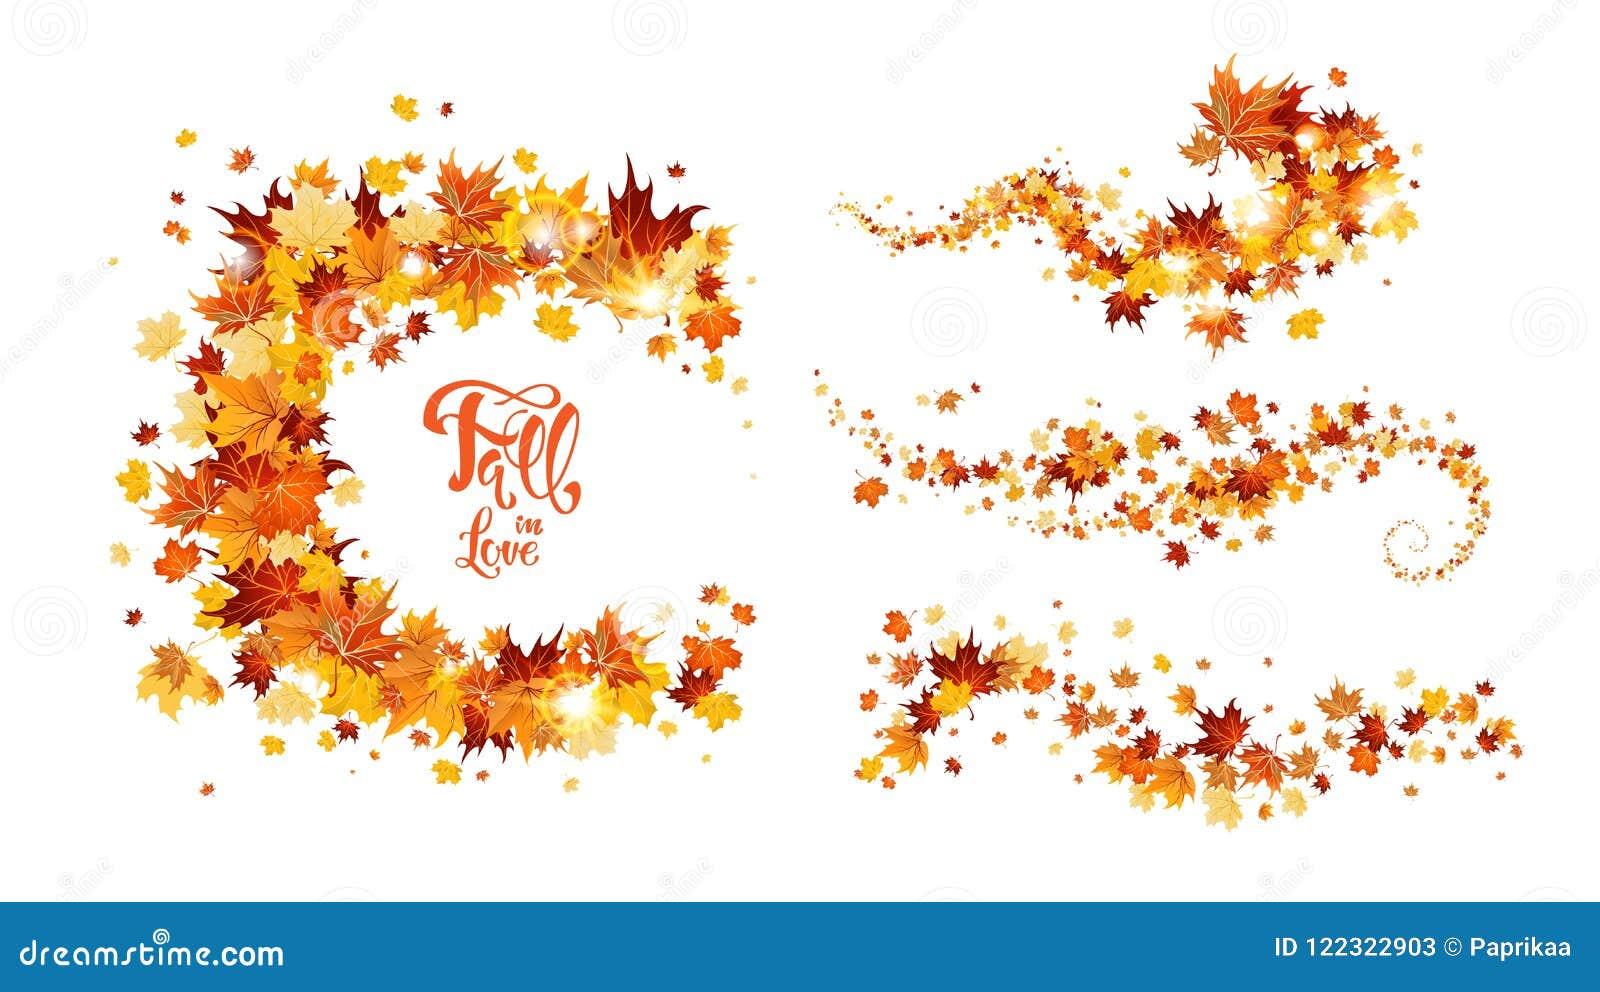 Autumn Leaves Swirl